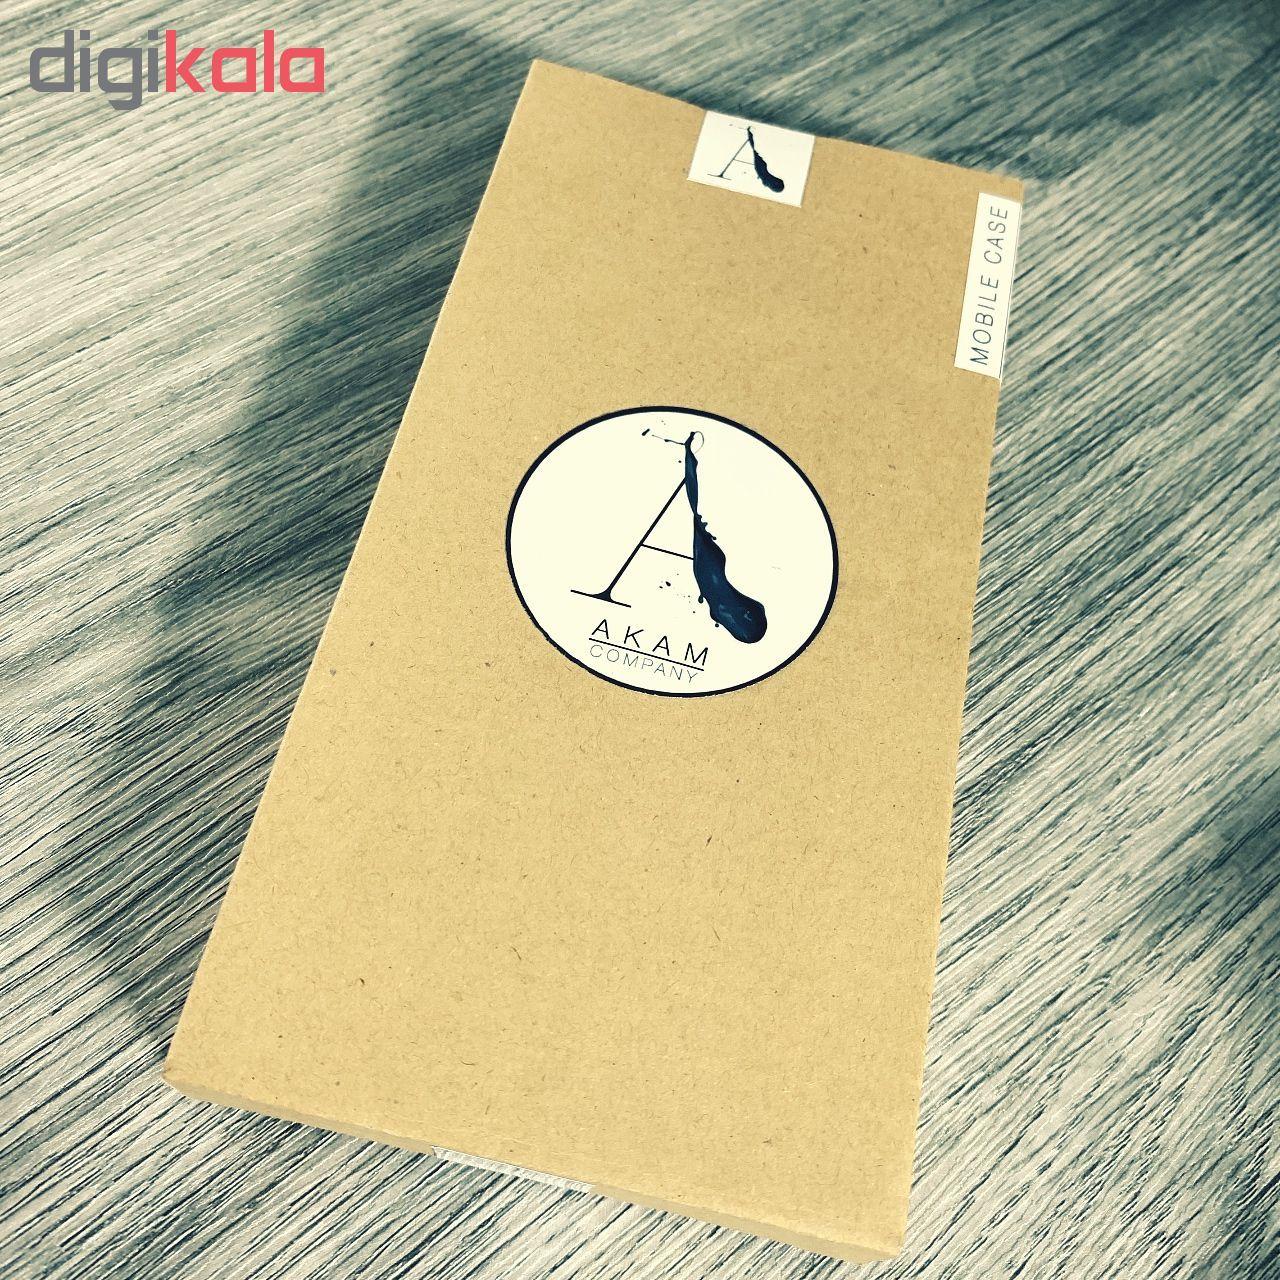 کاور آکام مدل AN91334 مناسب برای گوشی موبایل سامسونگ Galaxy Note 9 main 1 2